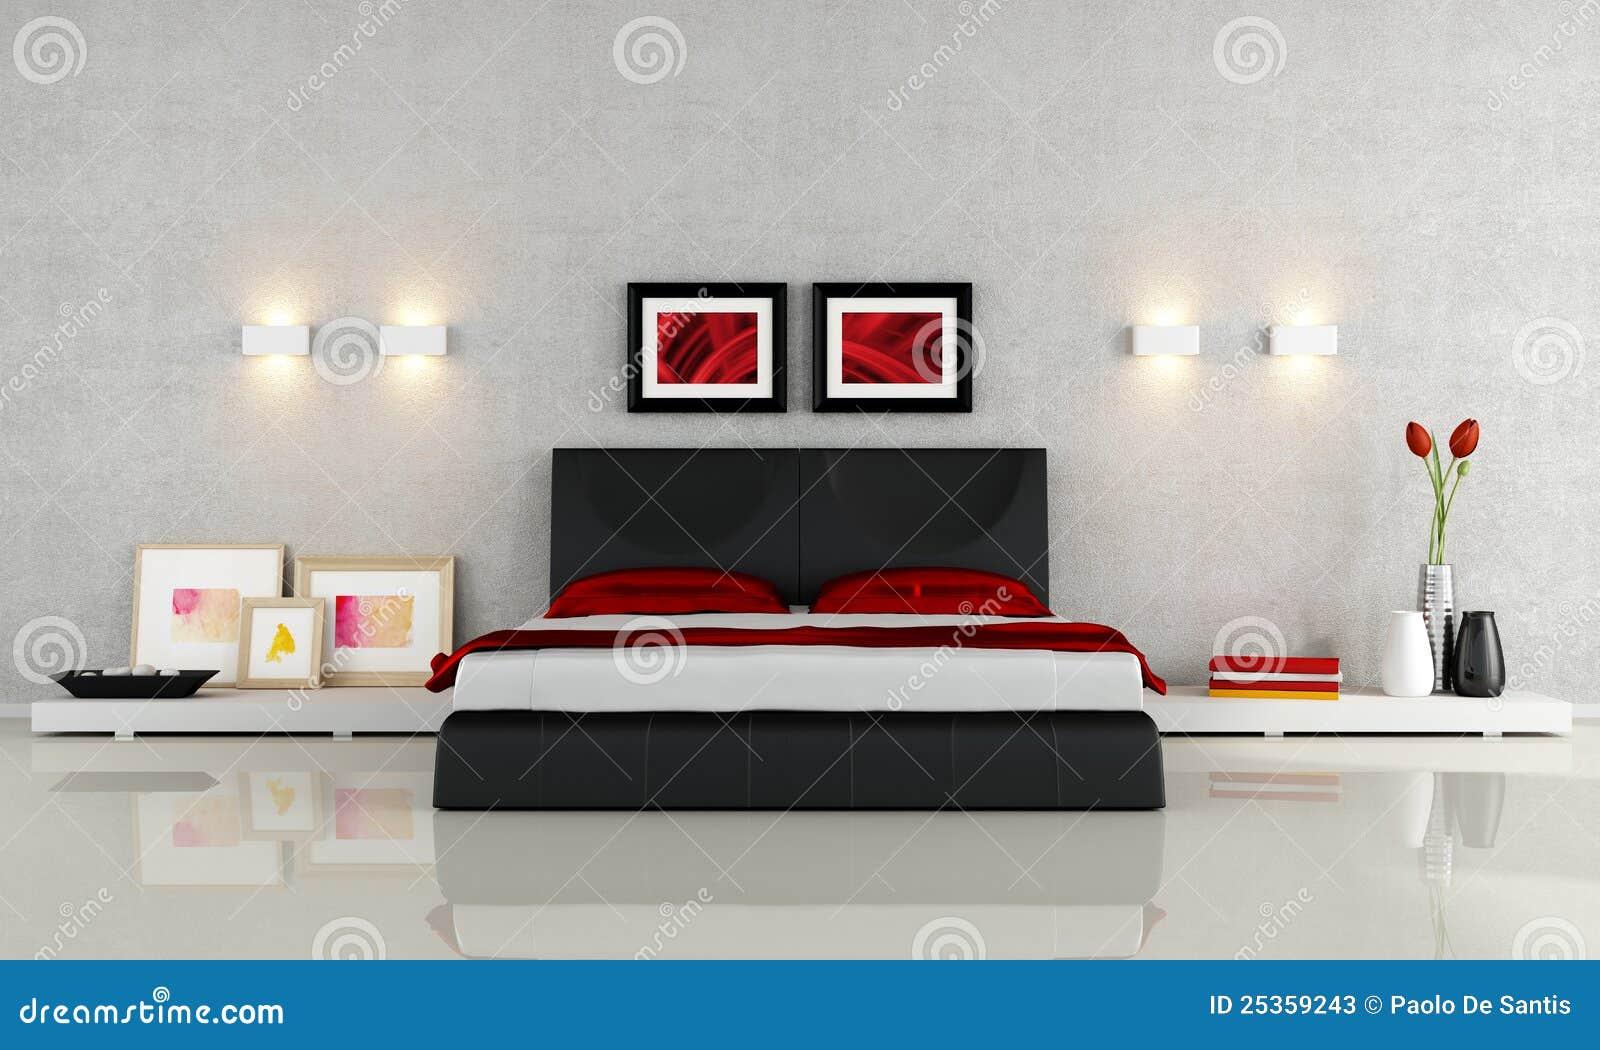 Modele chambre gris et rouge for Photo chambre a coucher moderne